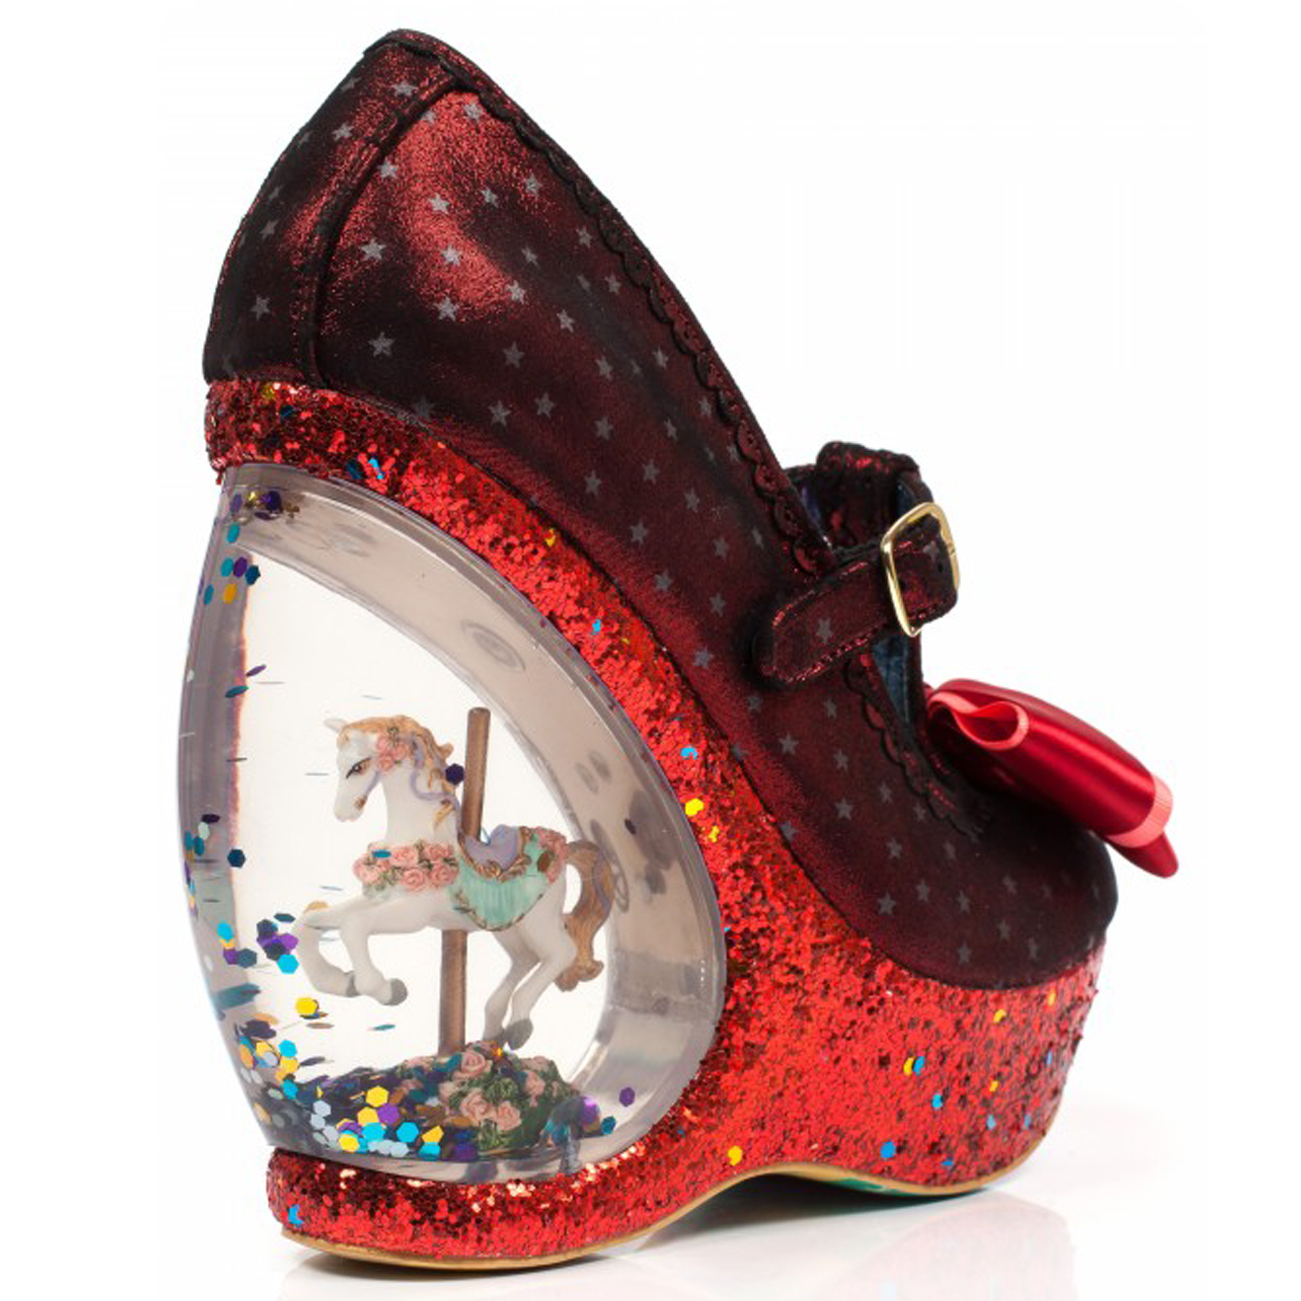 173389e7ef9 Womens Irregular Choice Chestnut Glitter Carousel Wedge Platform ...